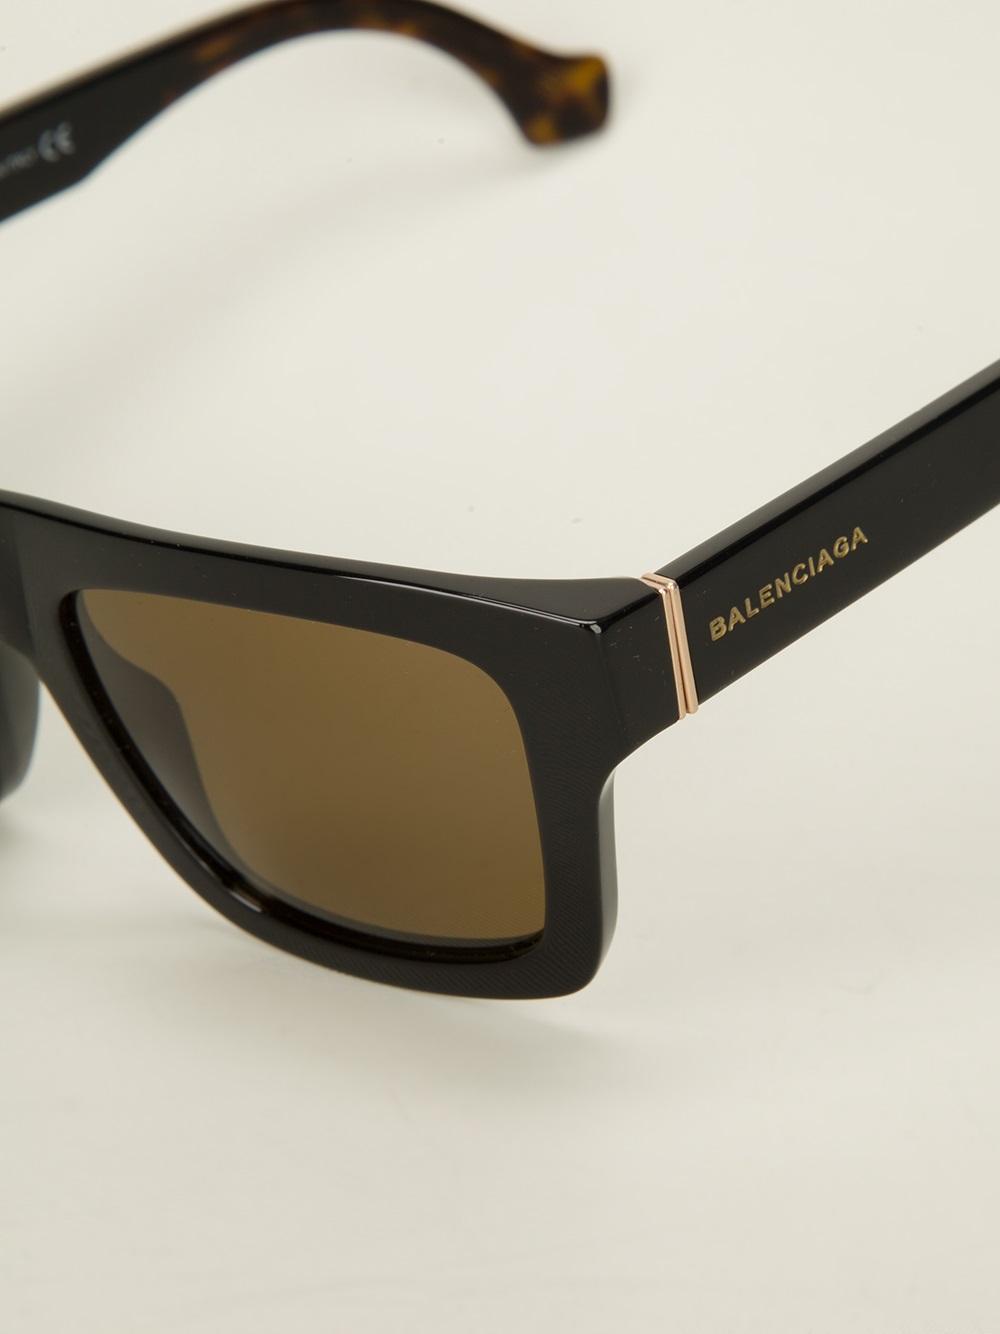 ac6297d0d4c Lyst - Balenciaga Square Frame Sunglasses in Black for Men